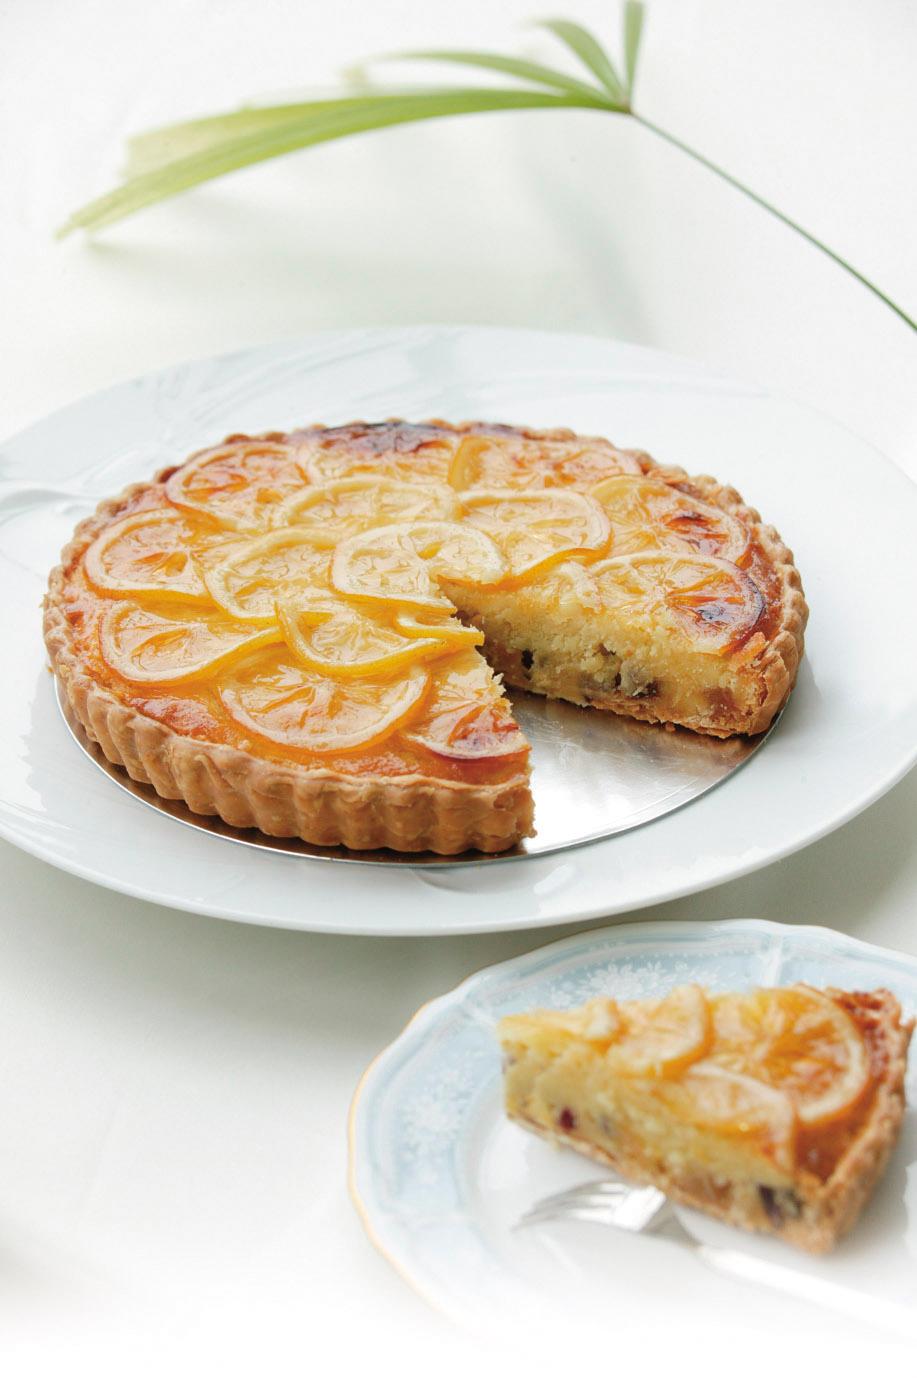 http://www.schule.jp/news/cake%E3%81%BB%E3%82%99%E3%81%8B%E3%81%97.jpg